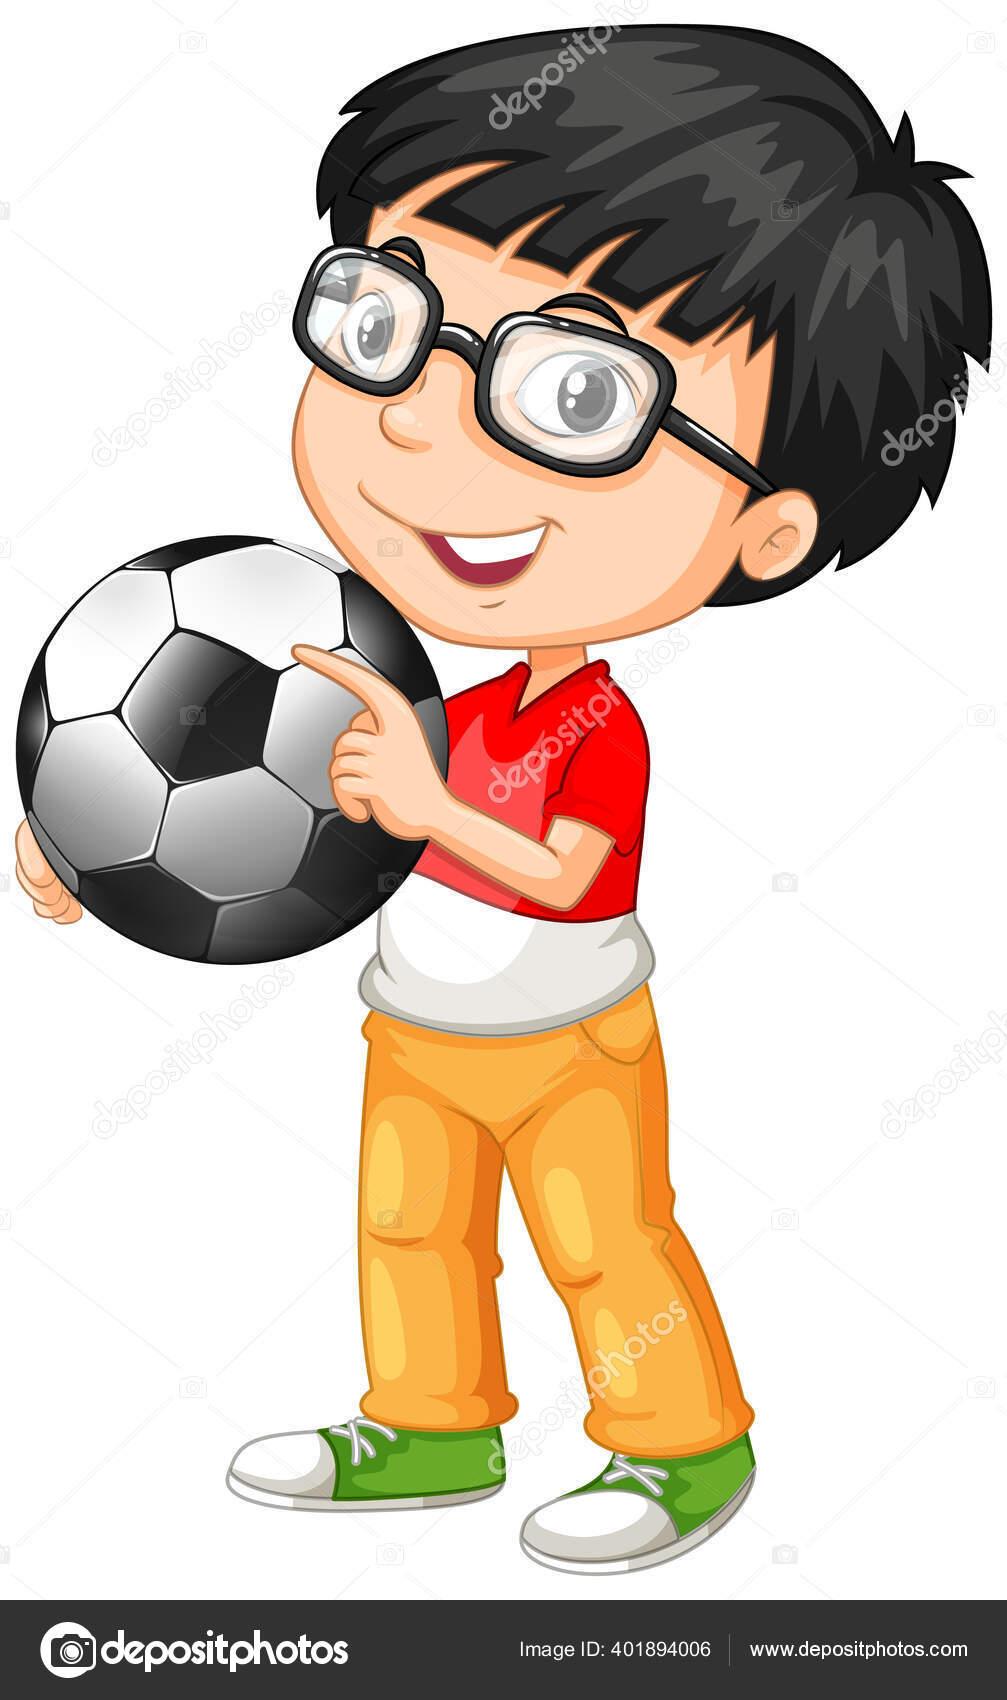 Anak Laki Laki Lucu Karakter Kartun Memegang Ilustrasi Sepak Bola Stok Vektor C Blueringmedia 401894006